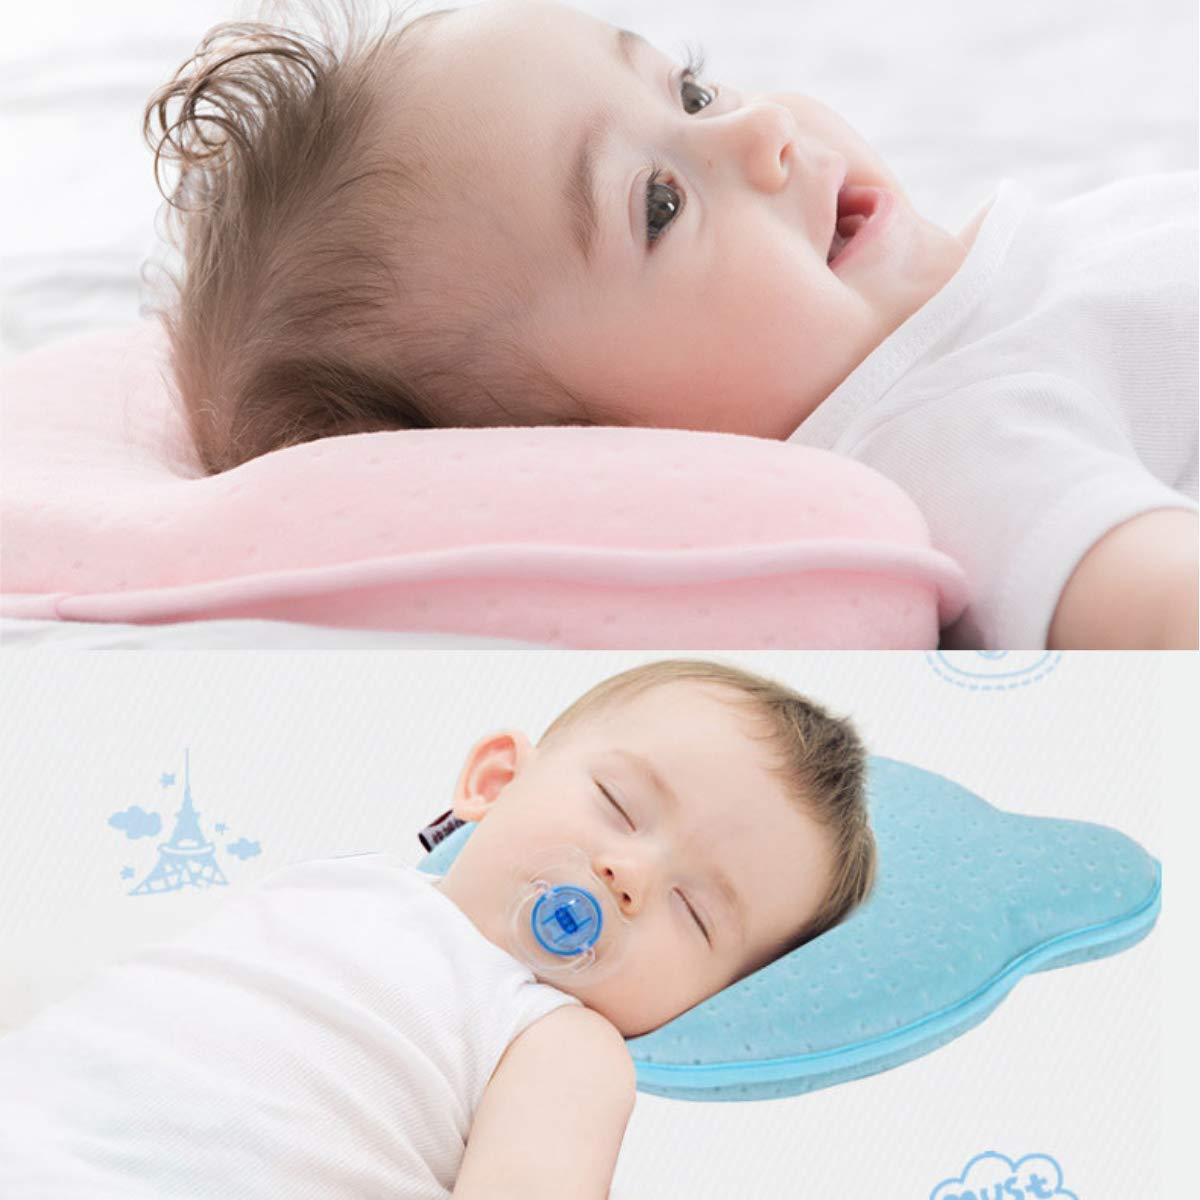 Amazon.com: Almohada de bebé para prevenir el síndrome de ...